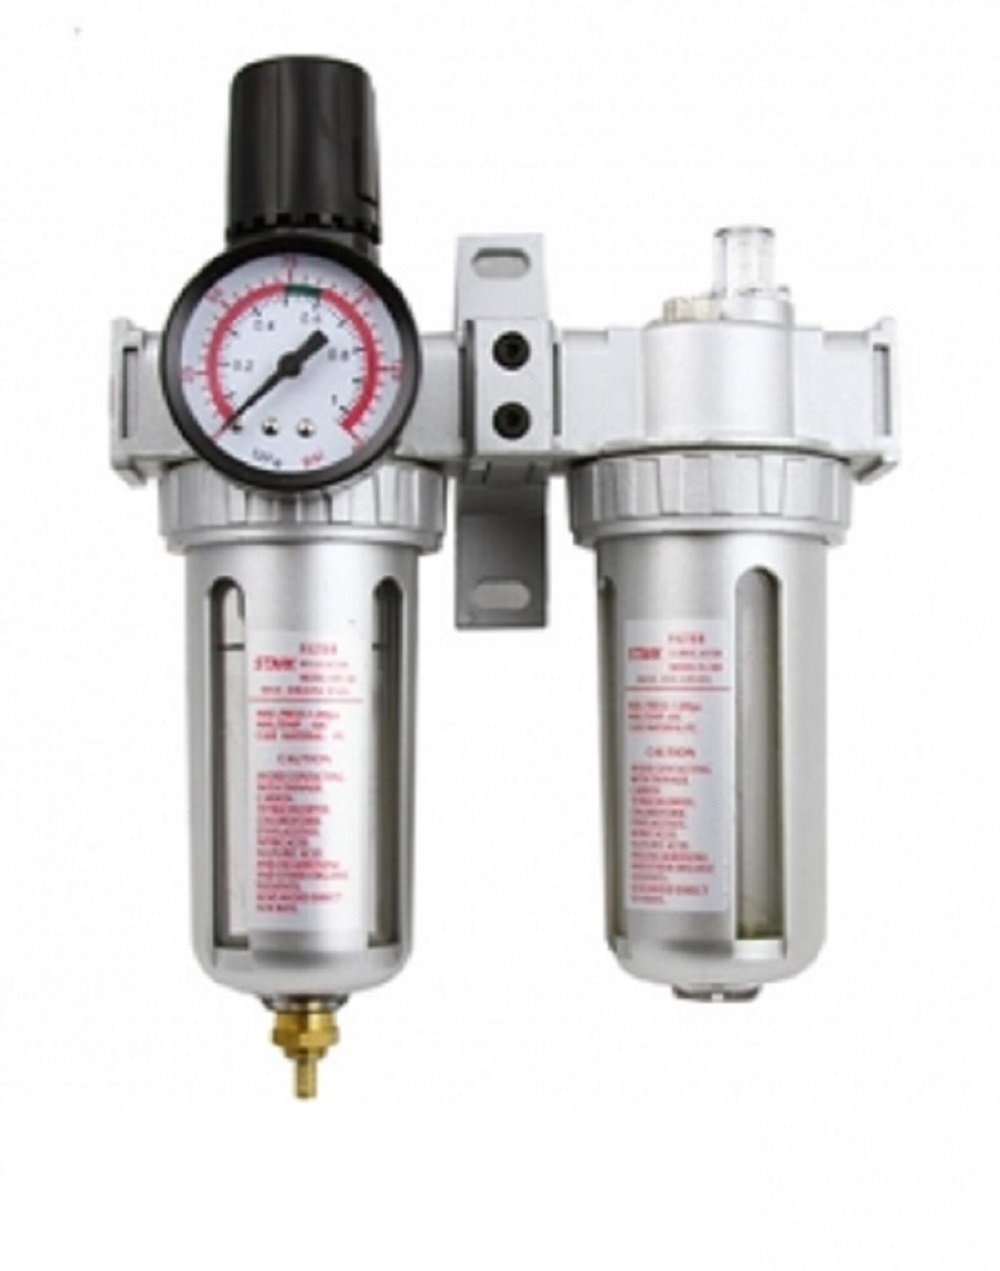 3 In 1 Twin Air Filter Pressure Regulator Gauge Kit 3/8'' Water/Oil Trap Separator by J&R Quality Tools